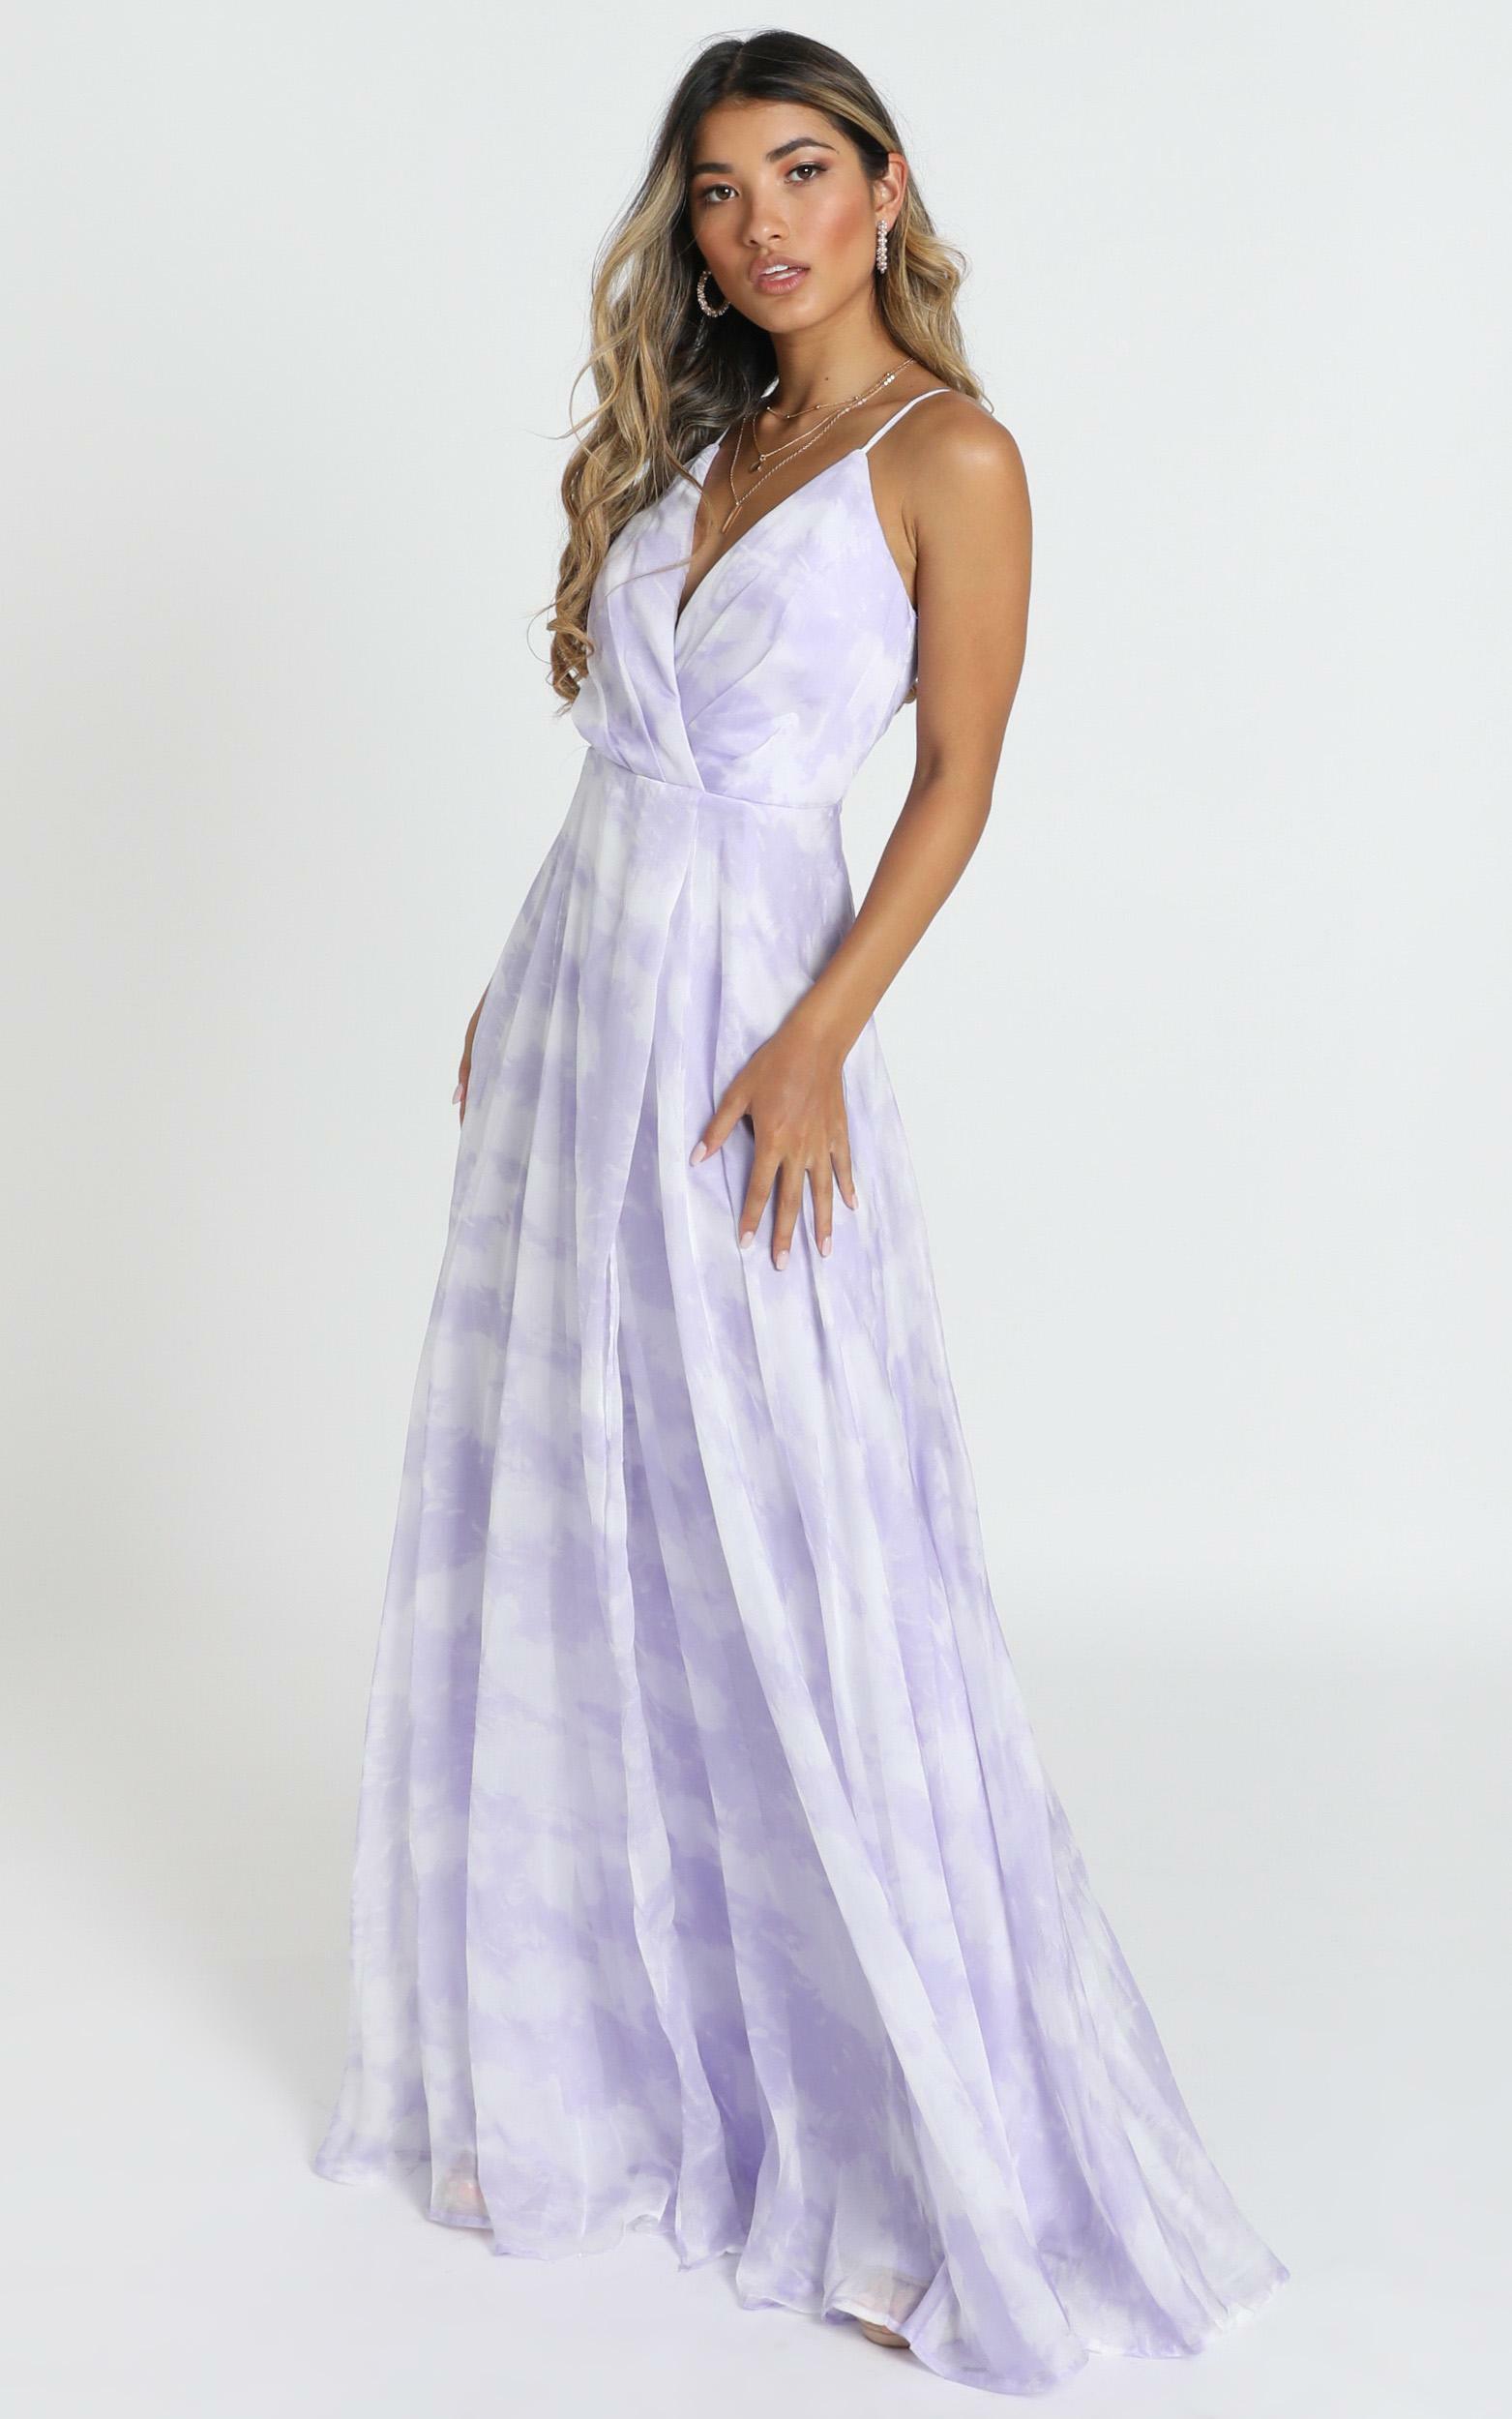 Cora maxi dress in lavender glitter - 12 (L), Purple, hi-res image number null